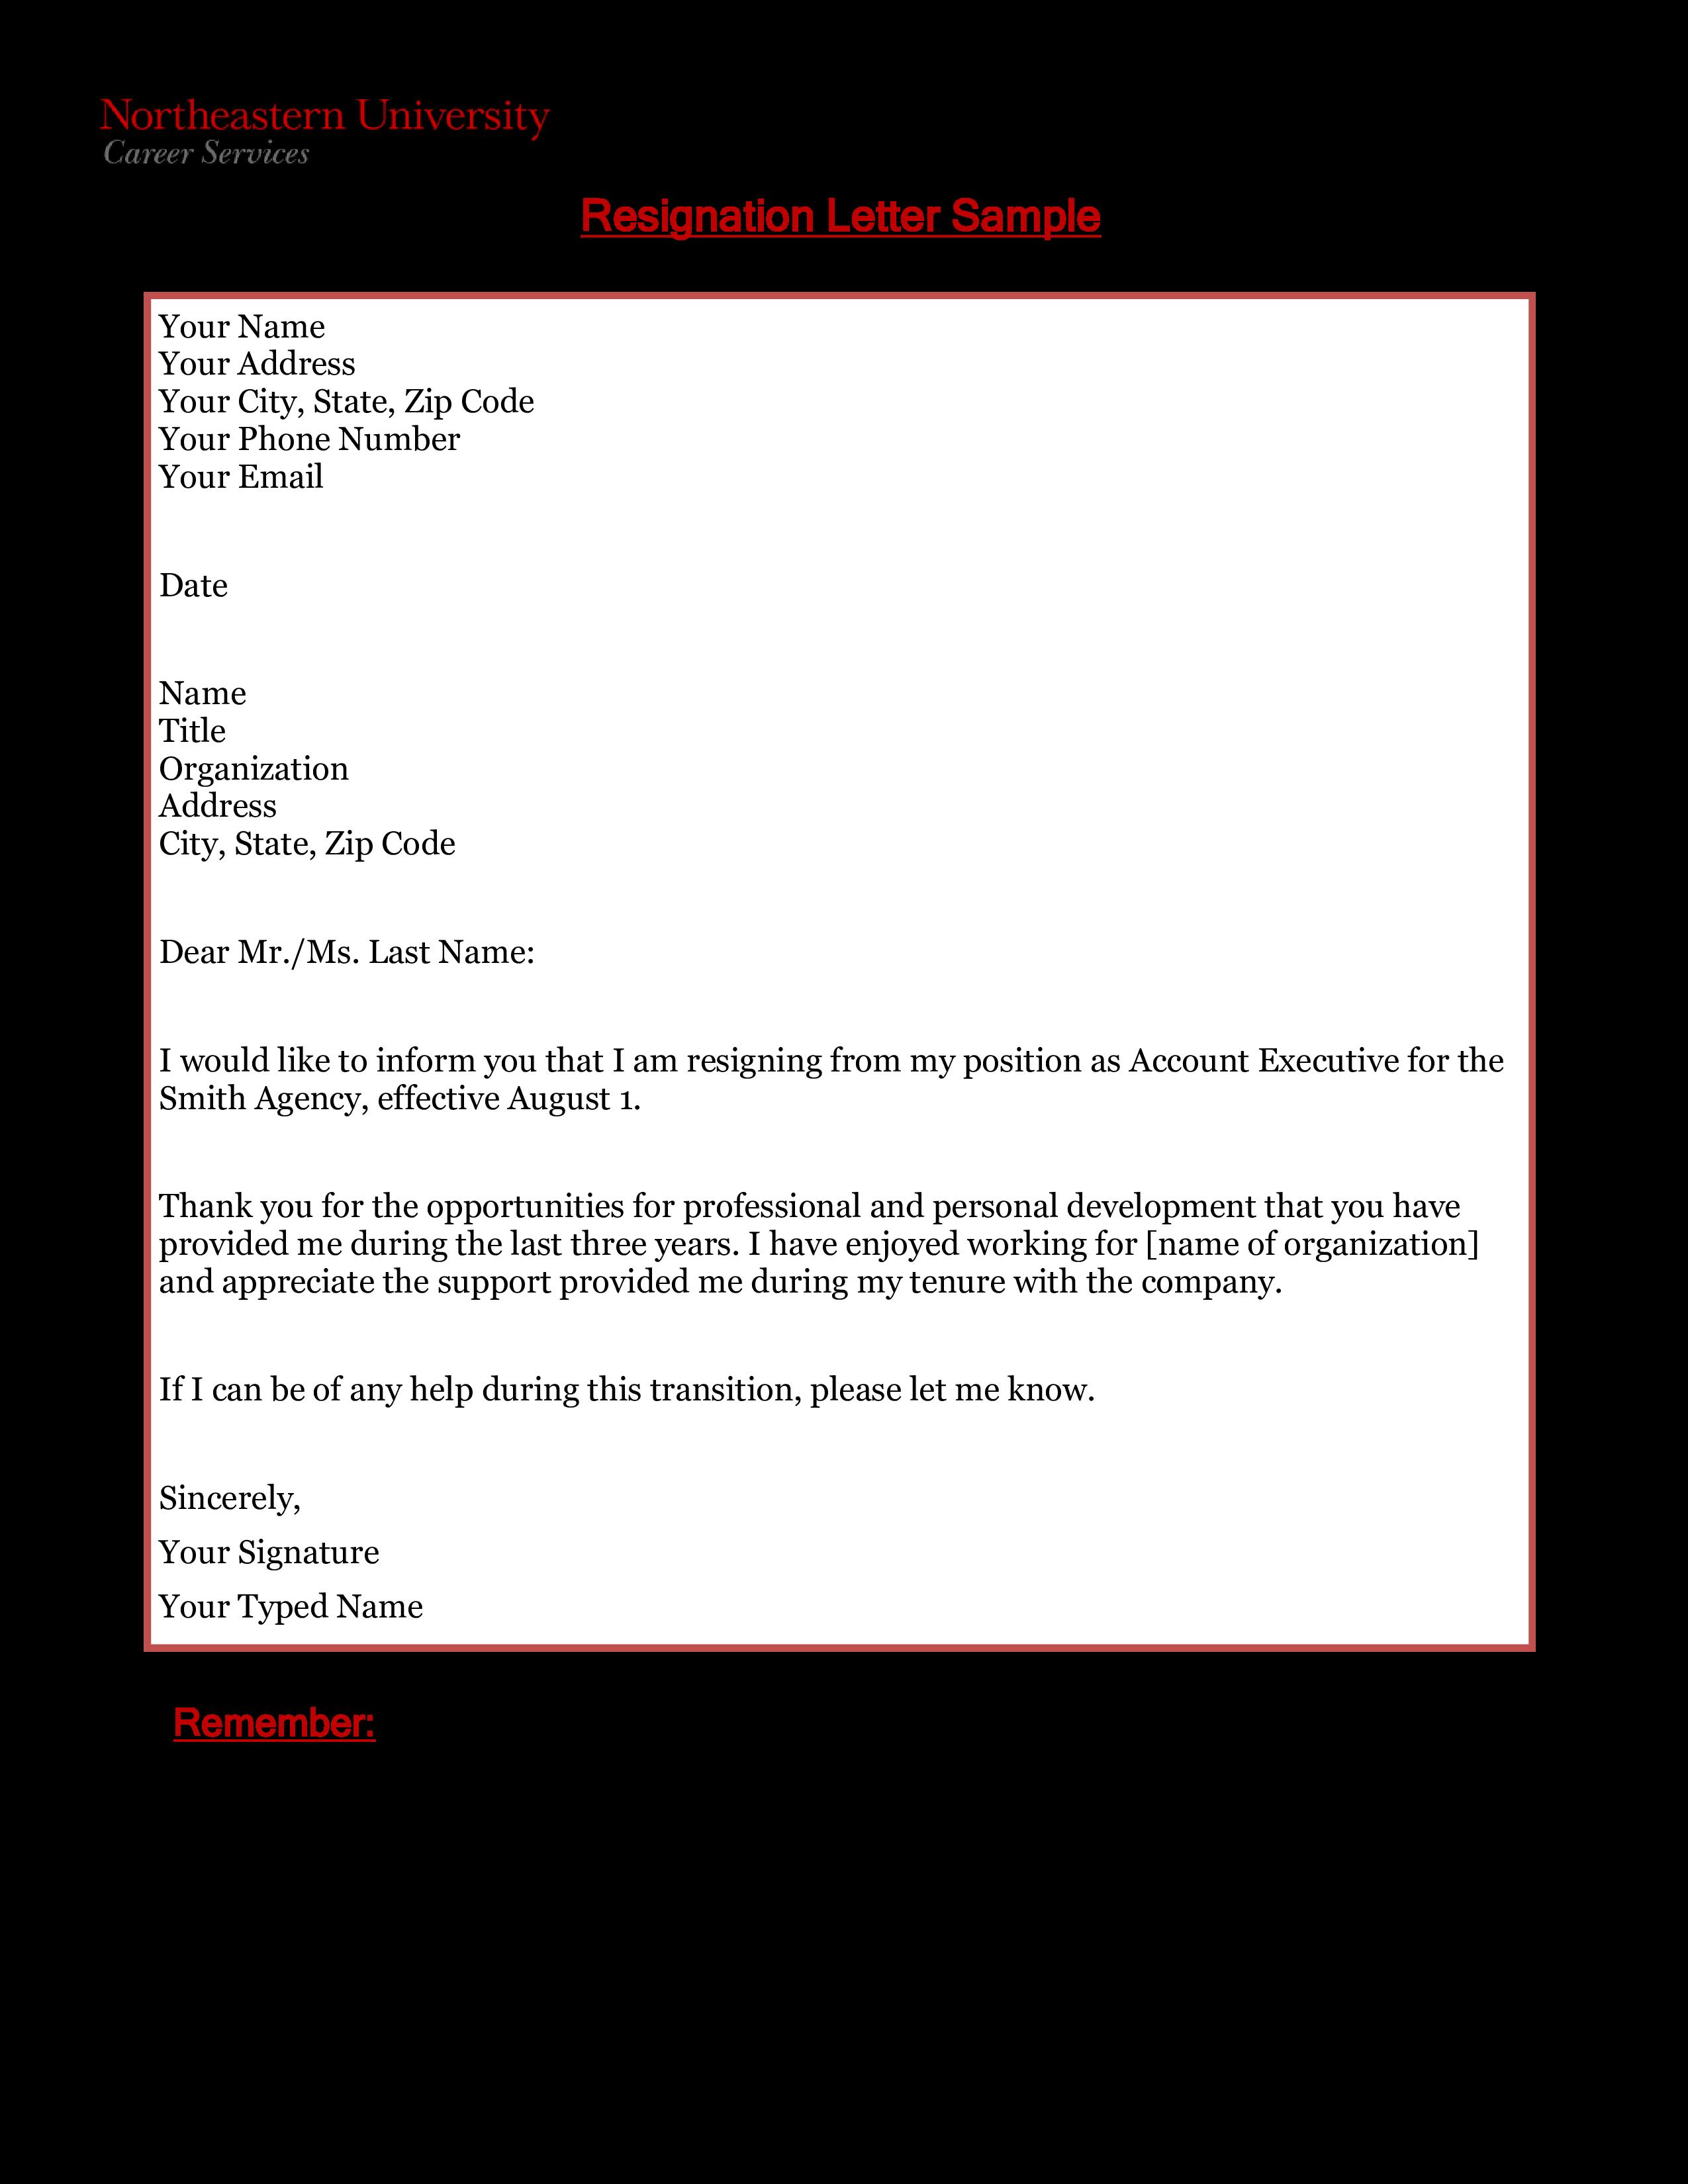 Sample Work Resignation Letter | Templates at ...